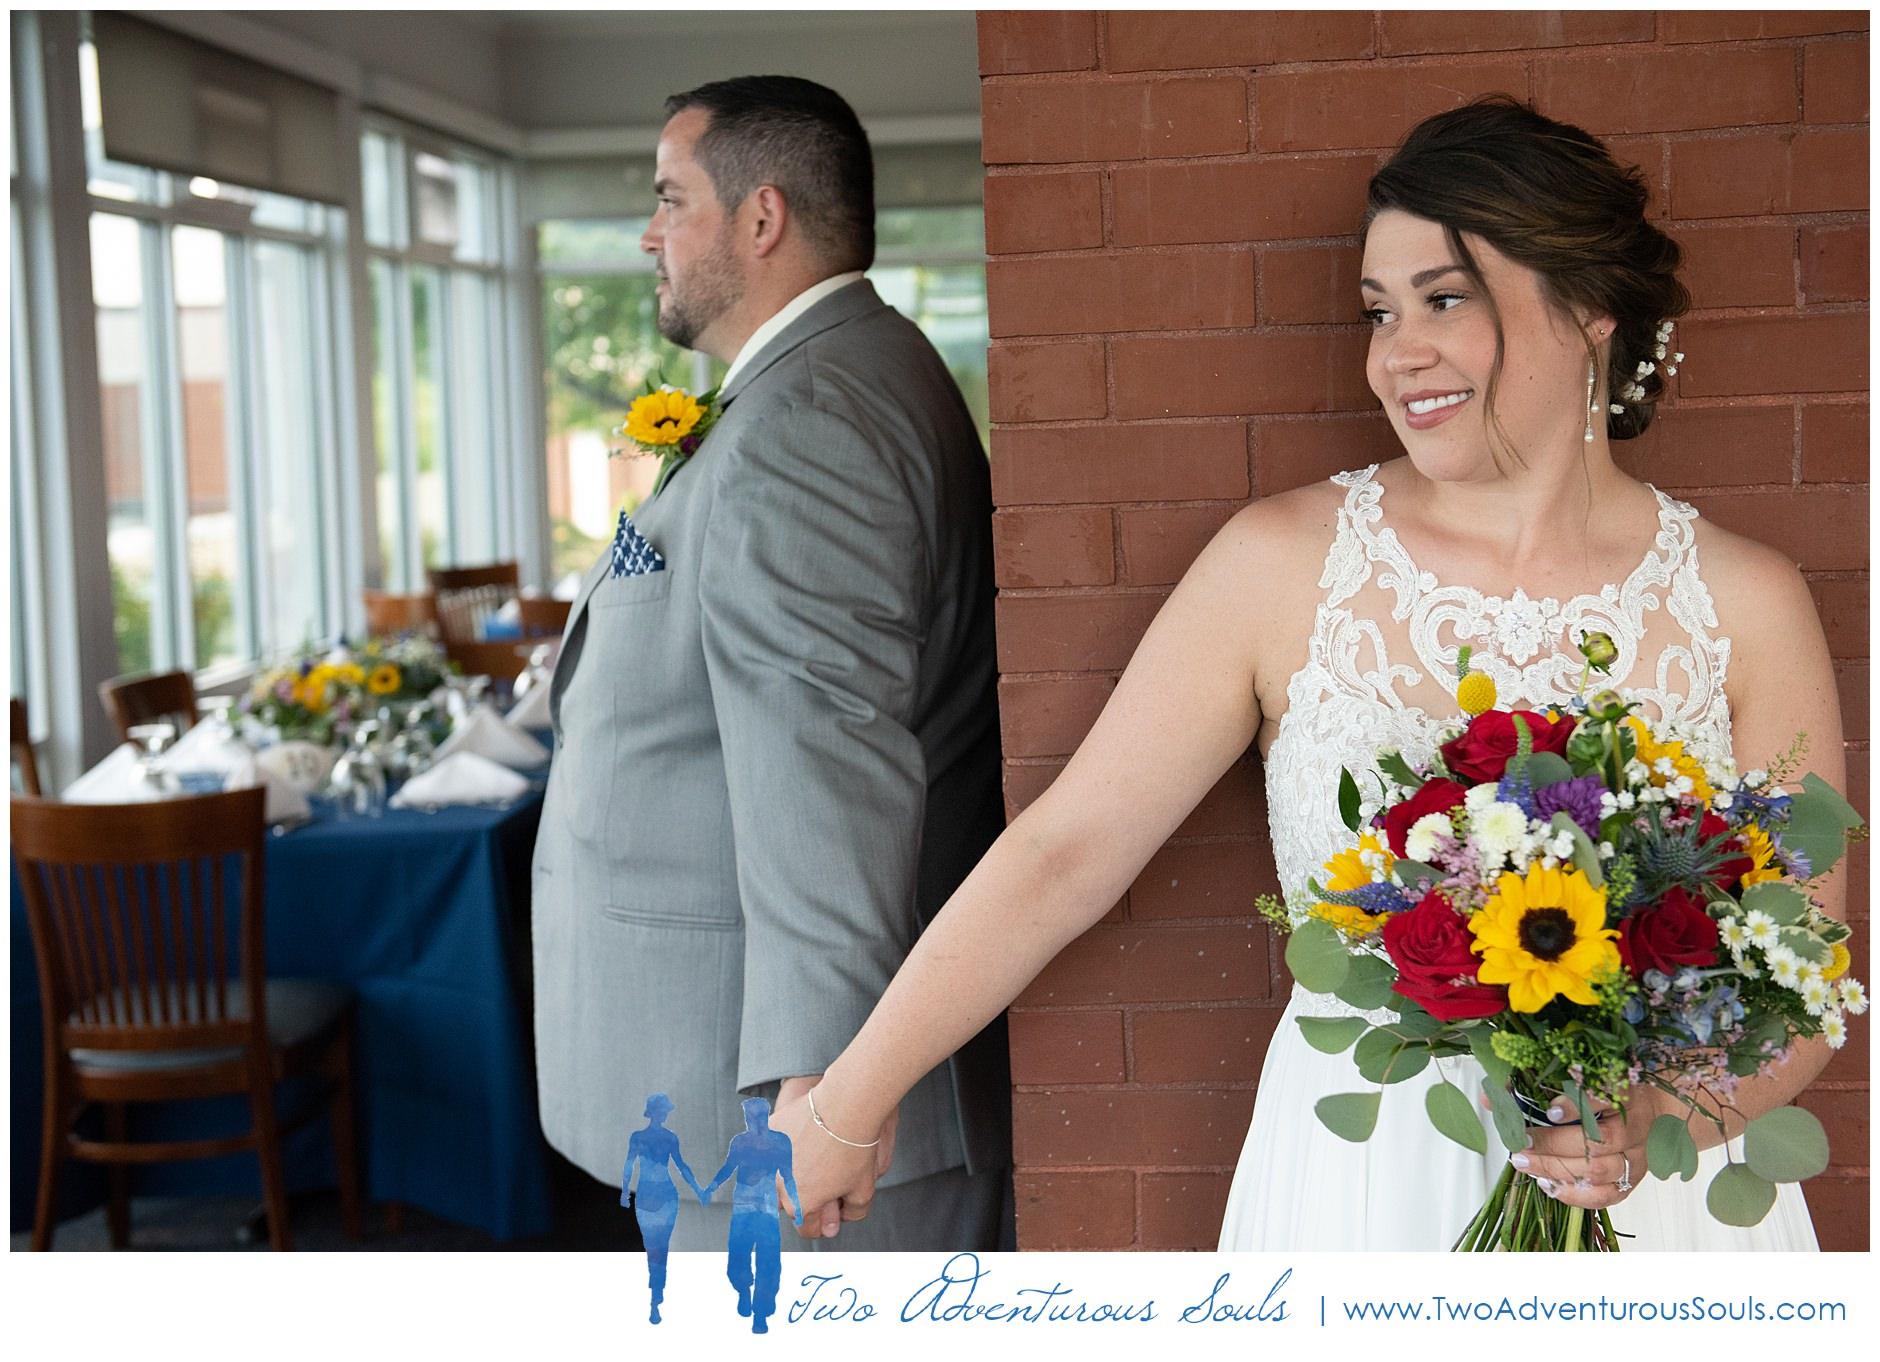 Maine Wedding Photographers, SMCC Wedding Photographers, Southern Maine Community College Wedding Photographers, Two Adventurous Souls-AshleyAaron_0019.jpg